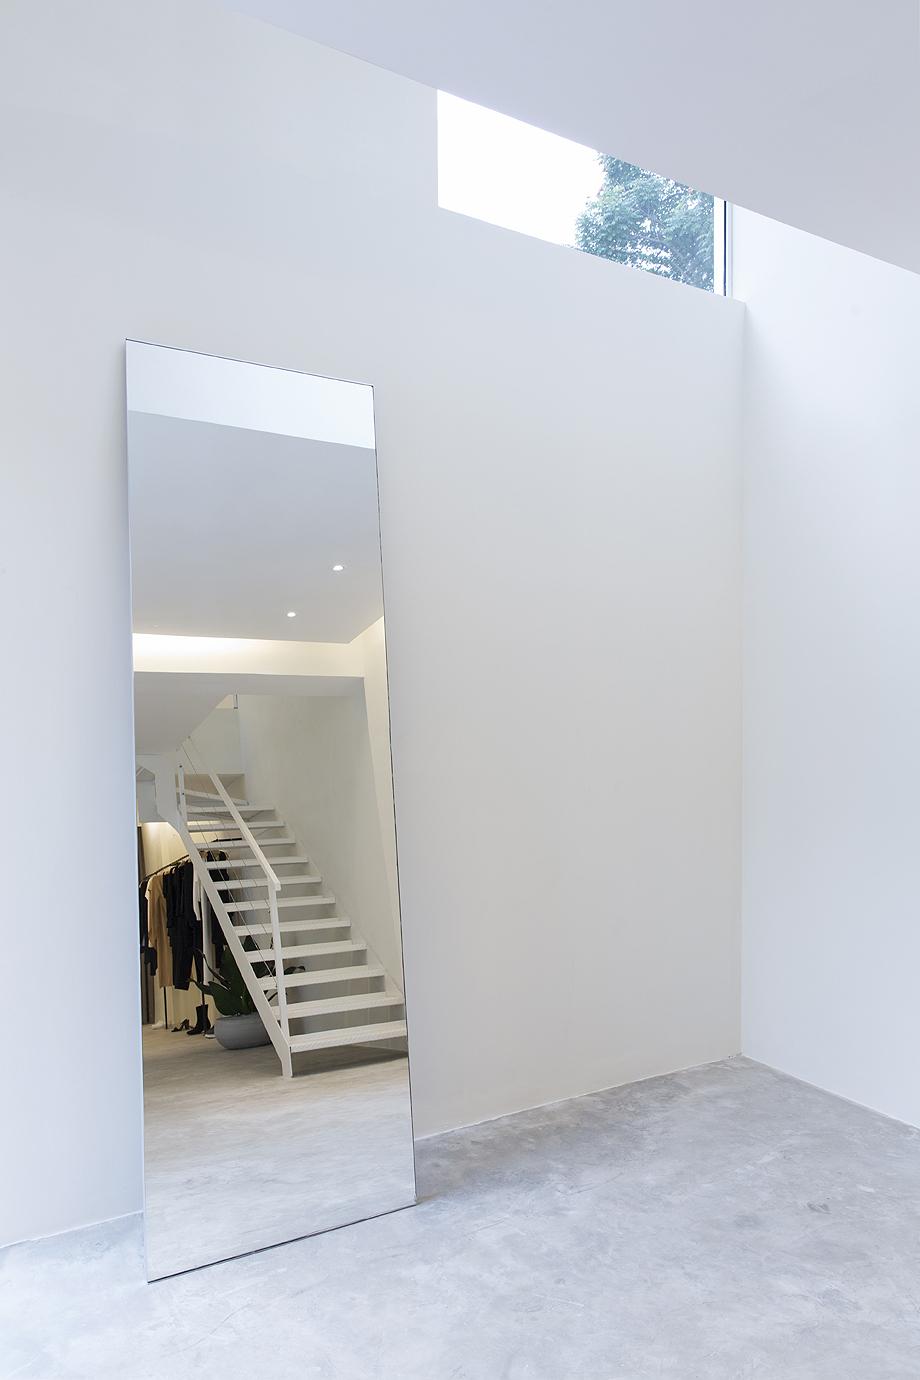 showroom egrey de mnma studio (5)